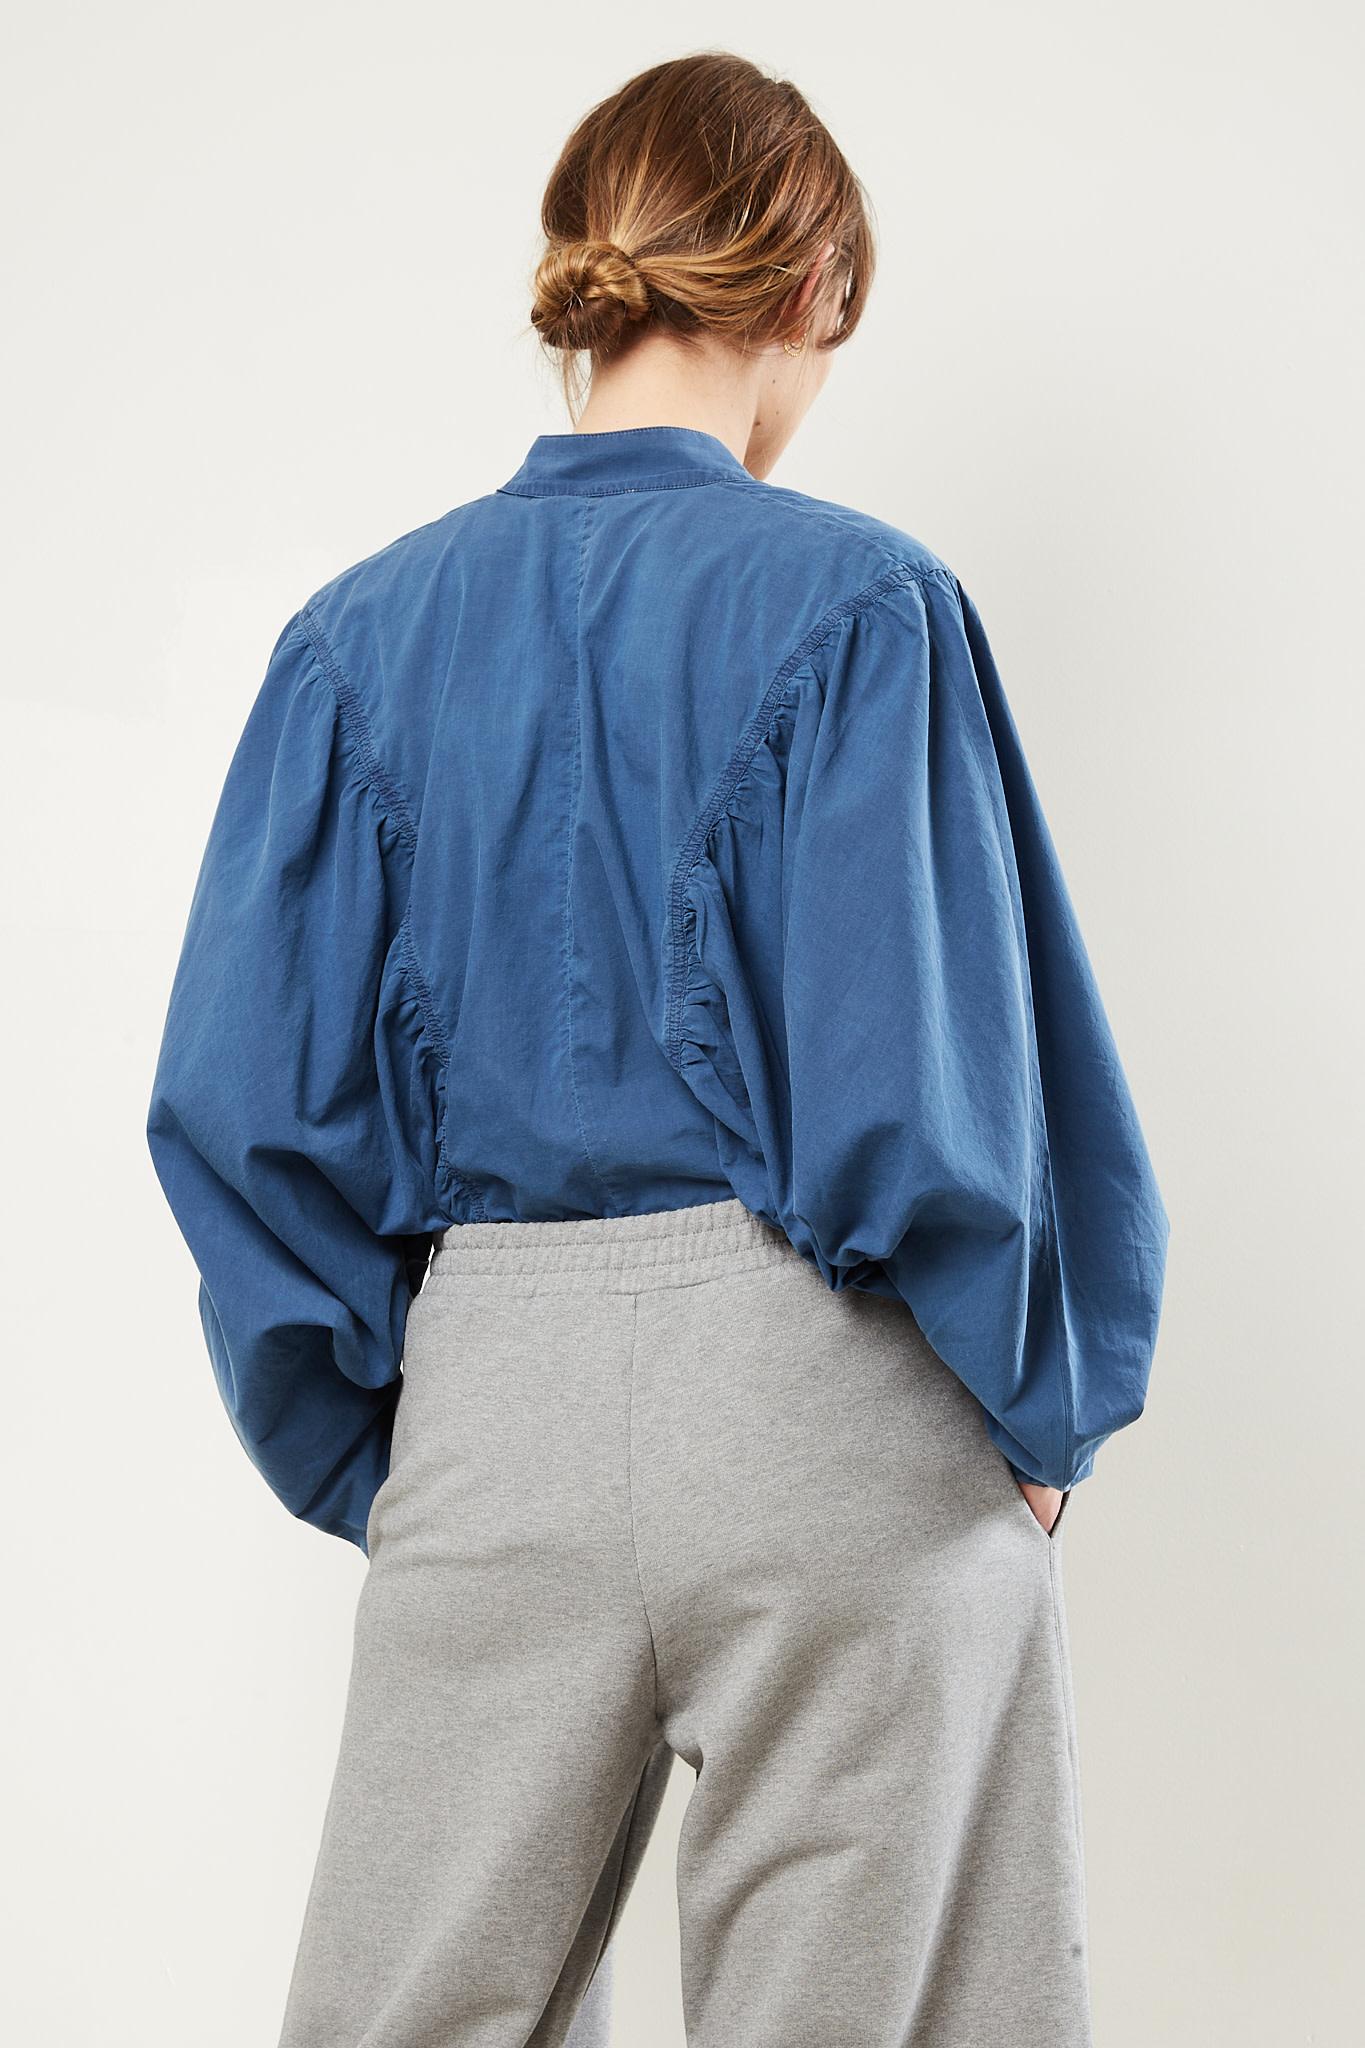 Facon Jacmīn - Dali shirt